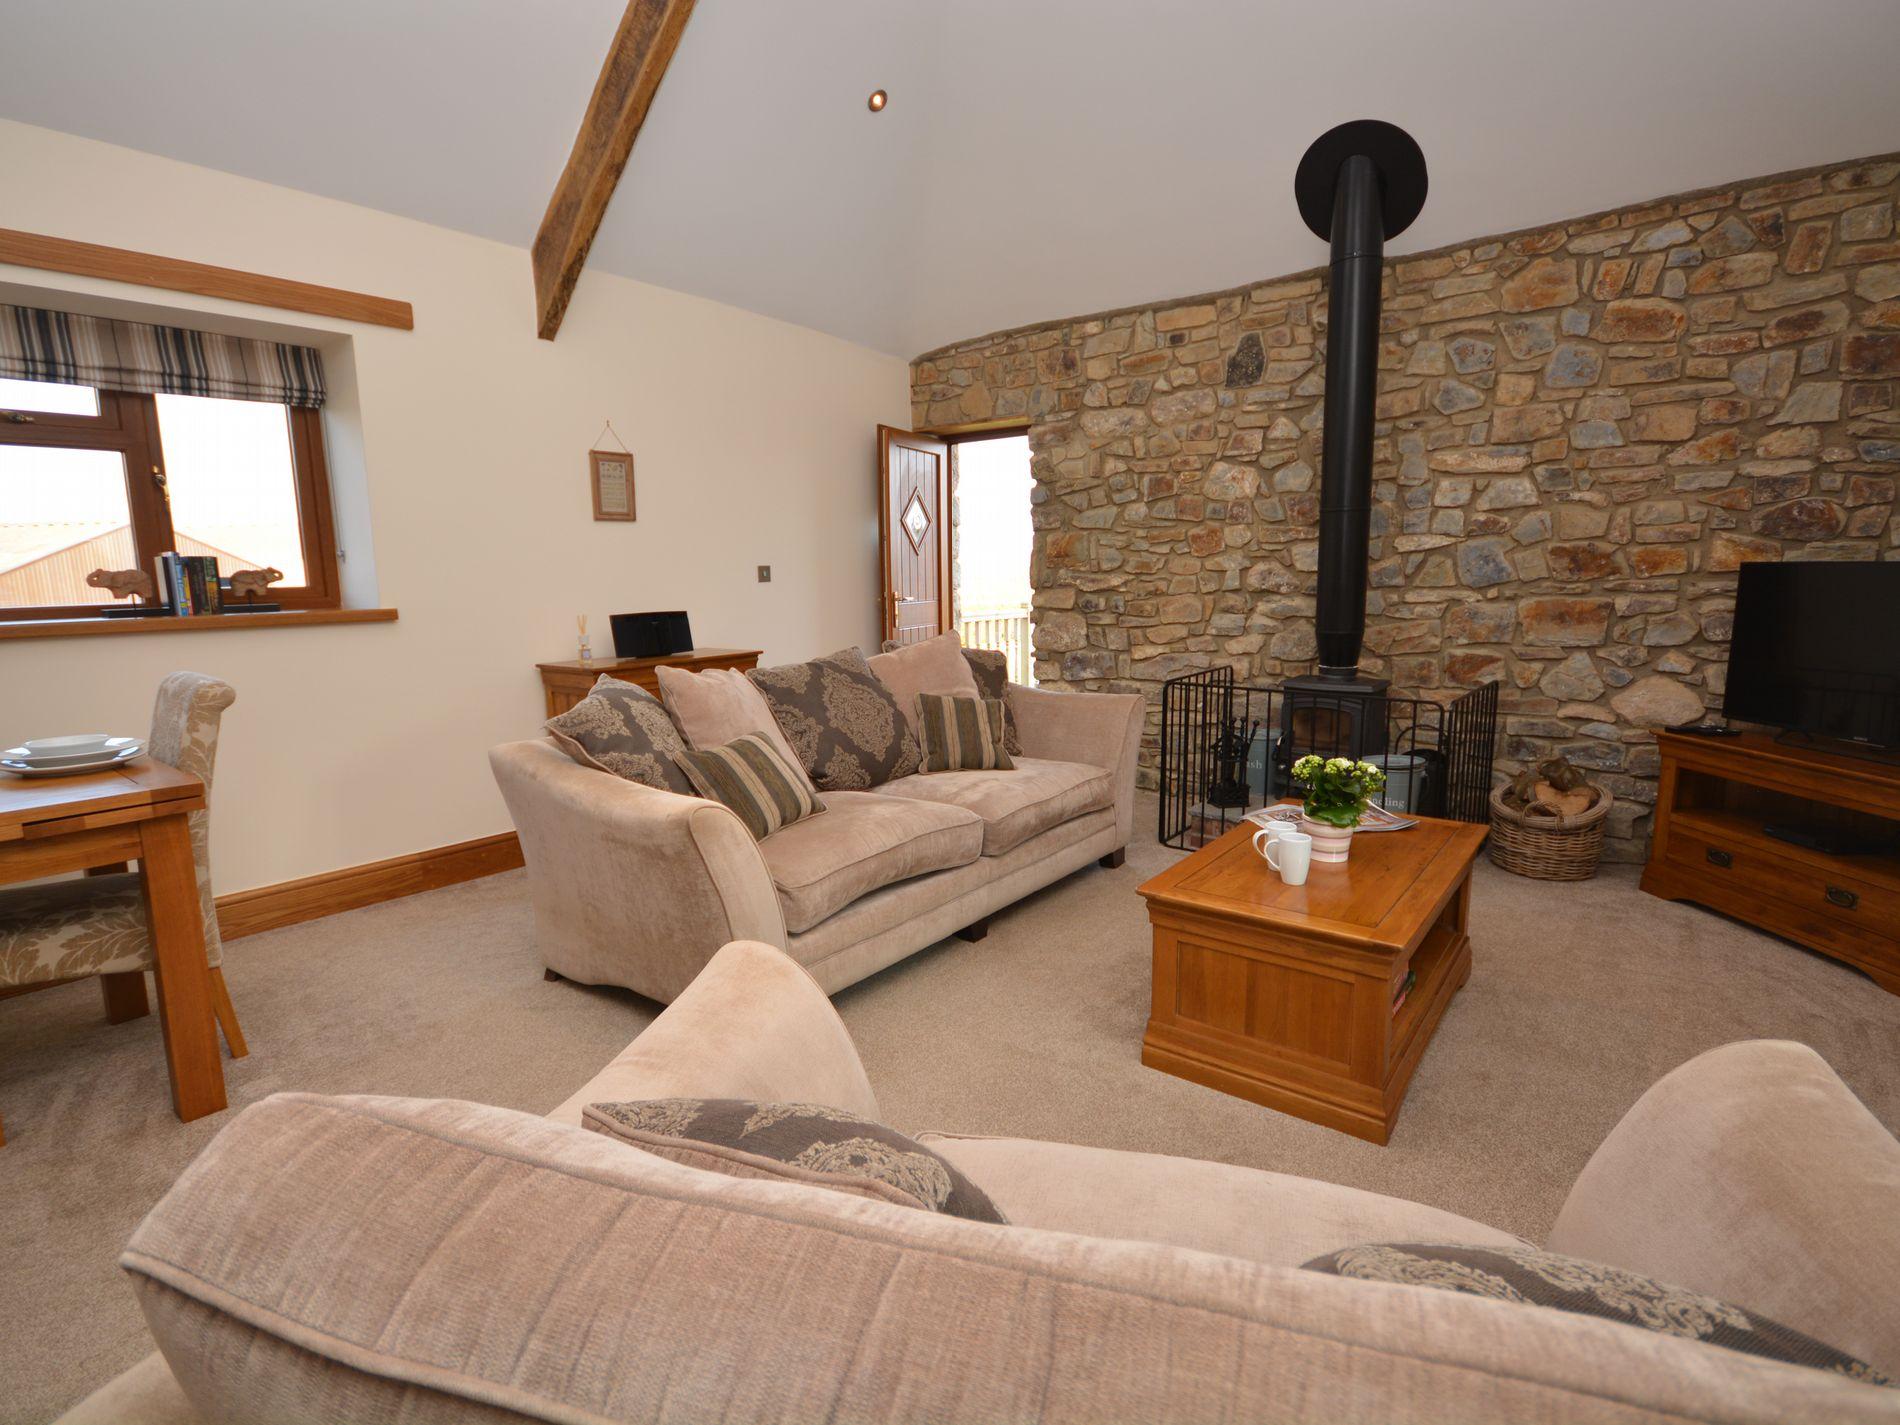 1 Bedroom Cottage in Okehampton, Devon